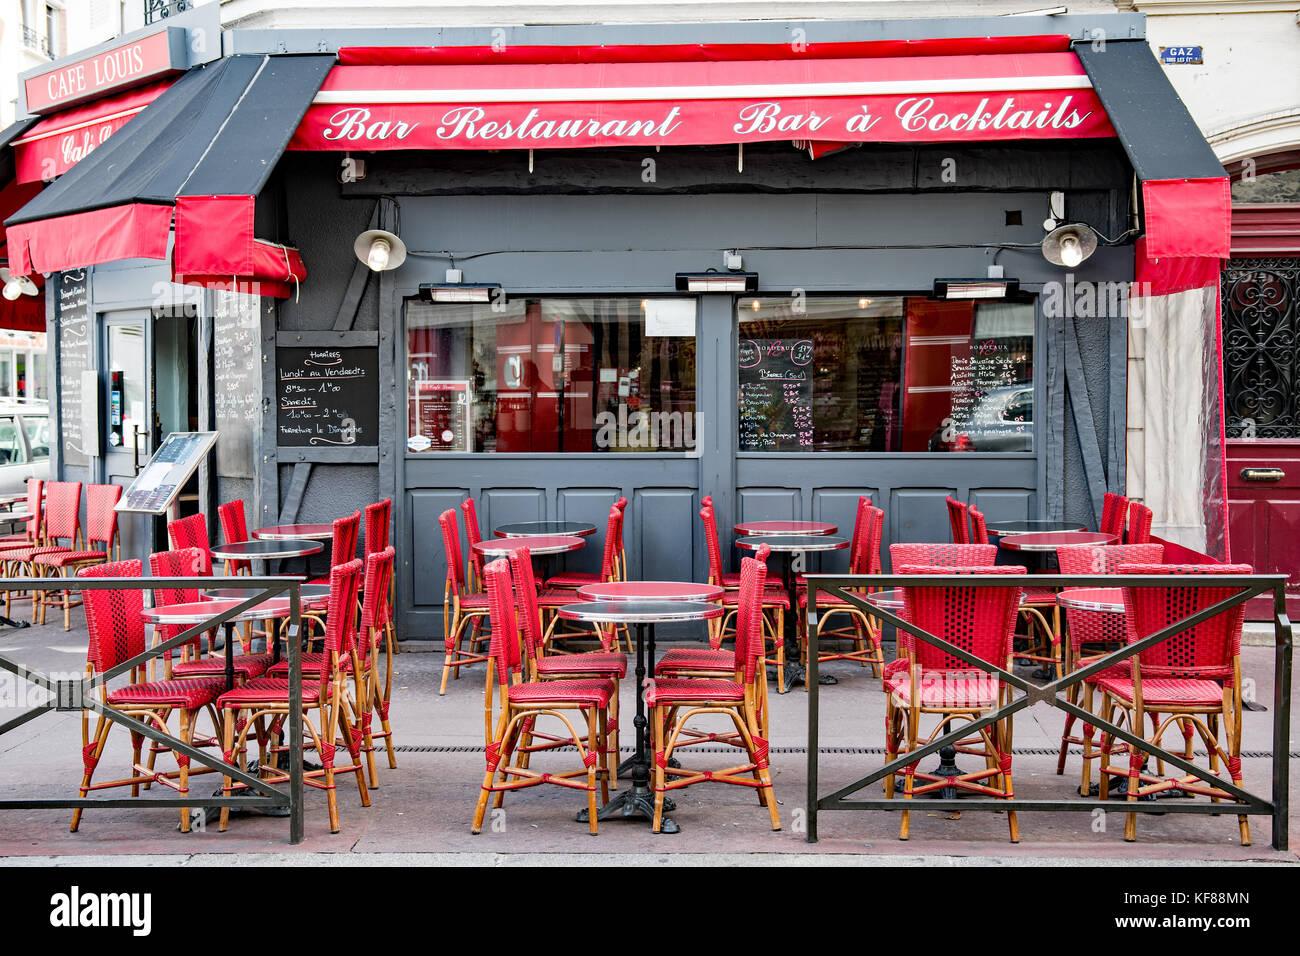 Cafe Rouge Bath Christmas Menu